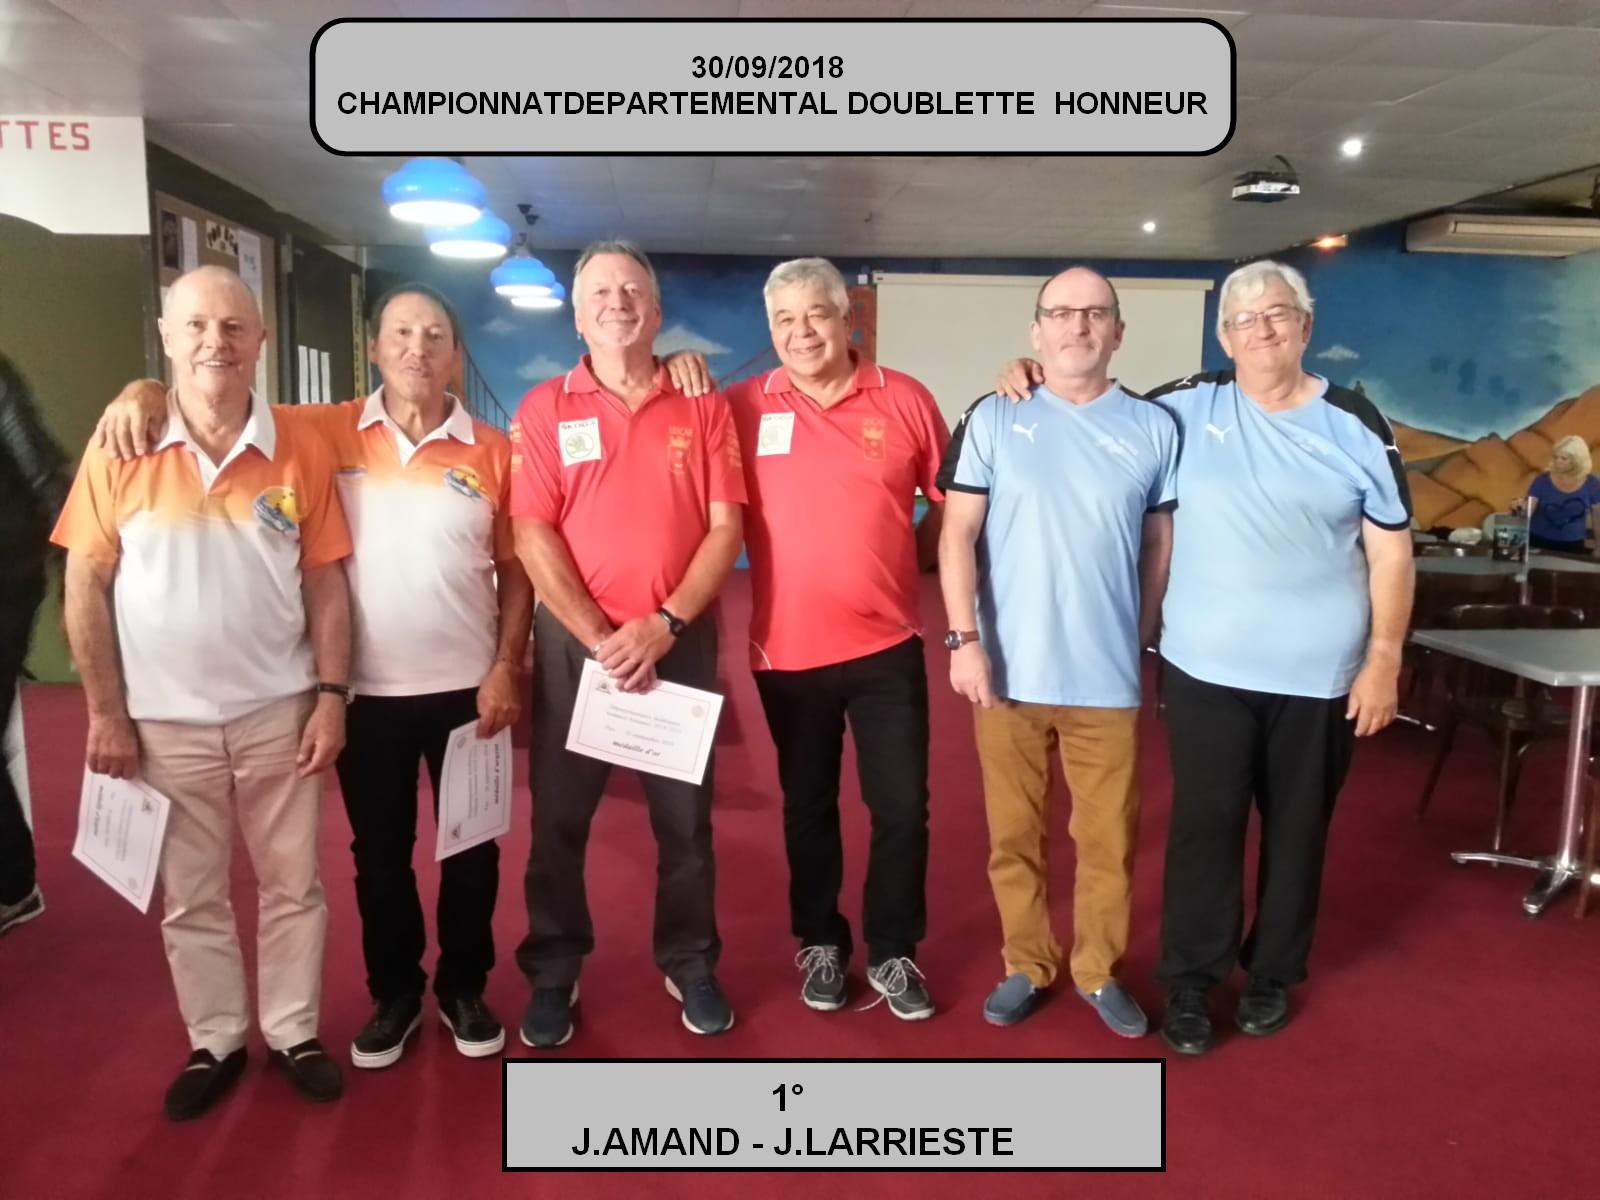 30/09/2018 DOUBLETTE HONNEUR DEPARTEMENTALE